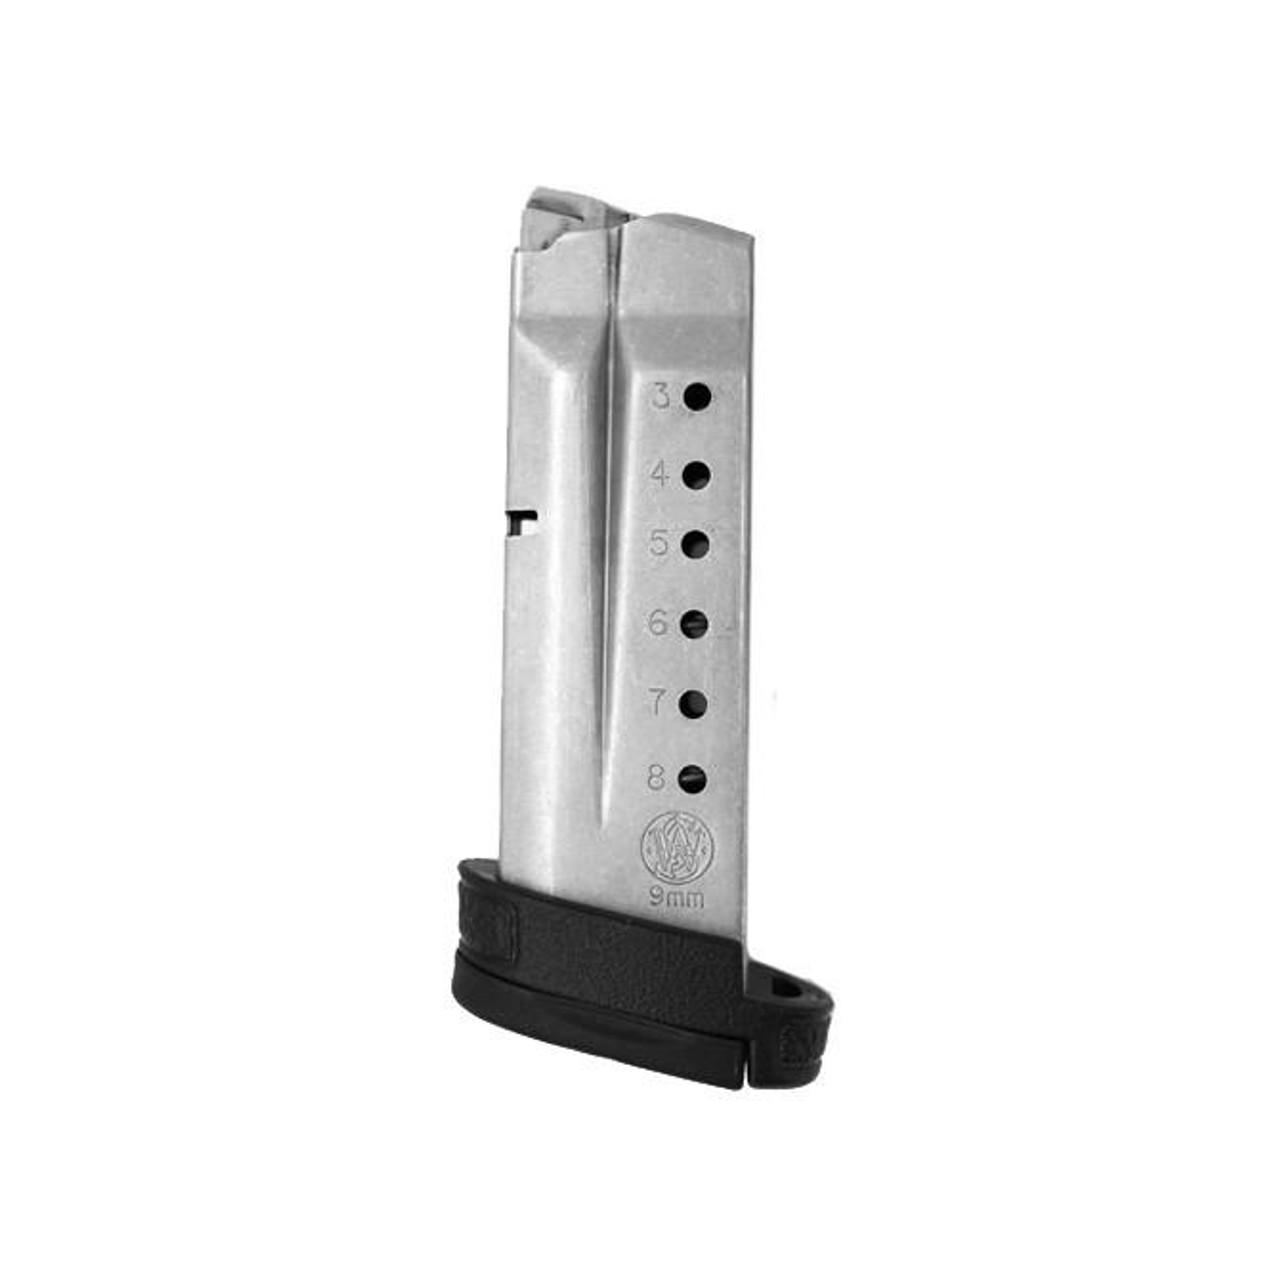 Smith & Wesson M&P Shield 9mm 8 Round Magazine